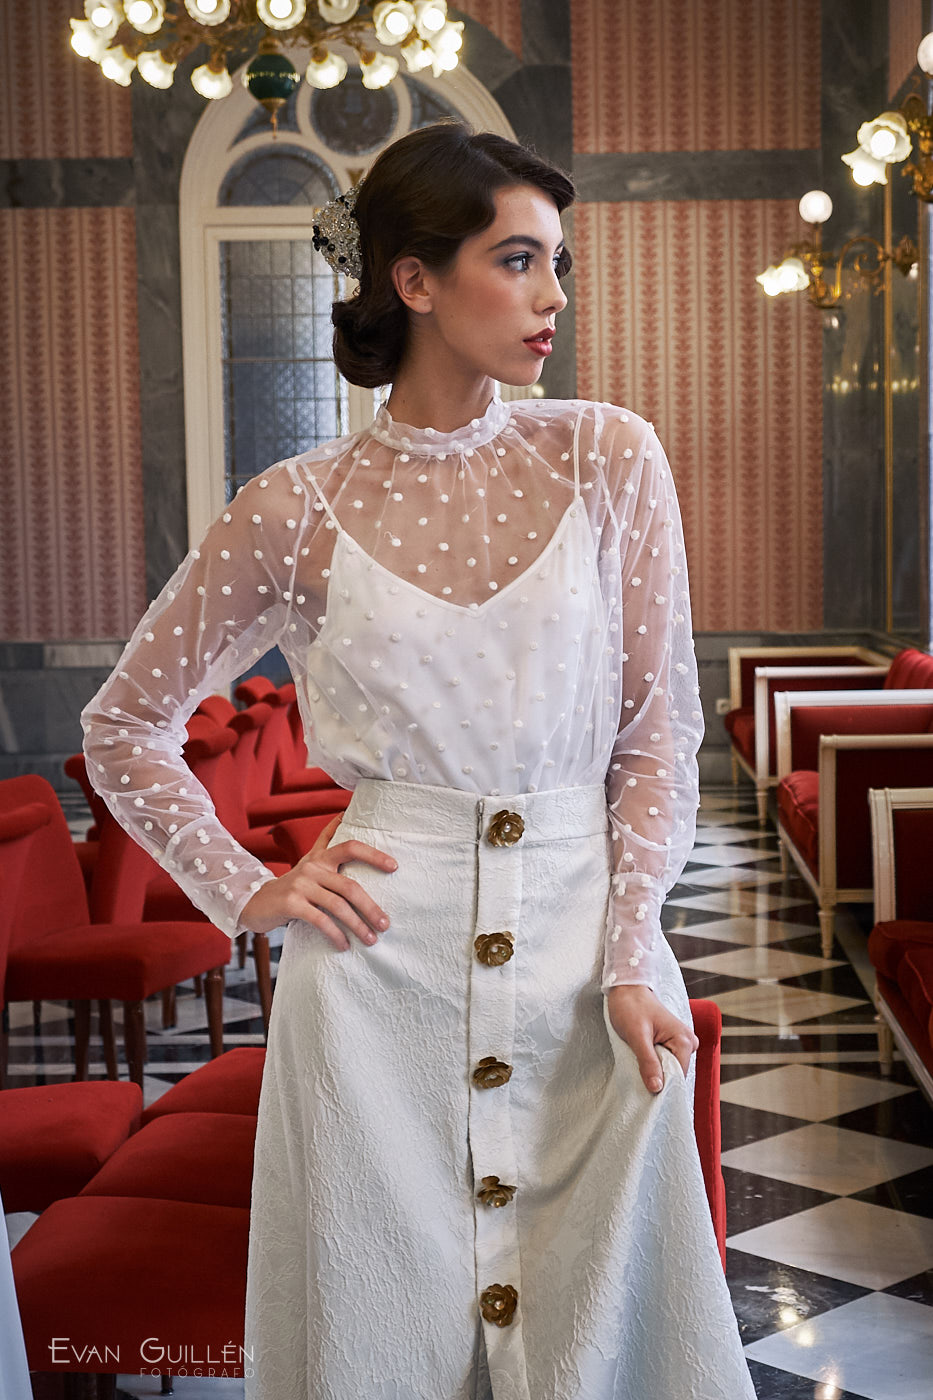 Modelo con vestido de novia de Cayetana Ferrer